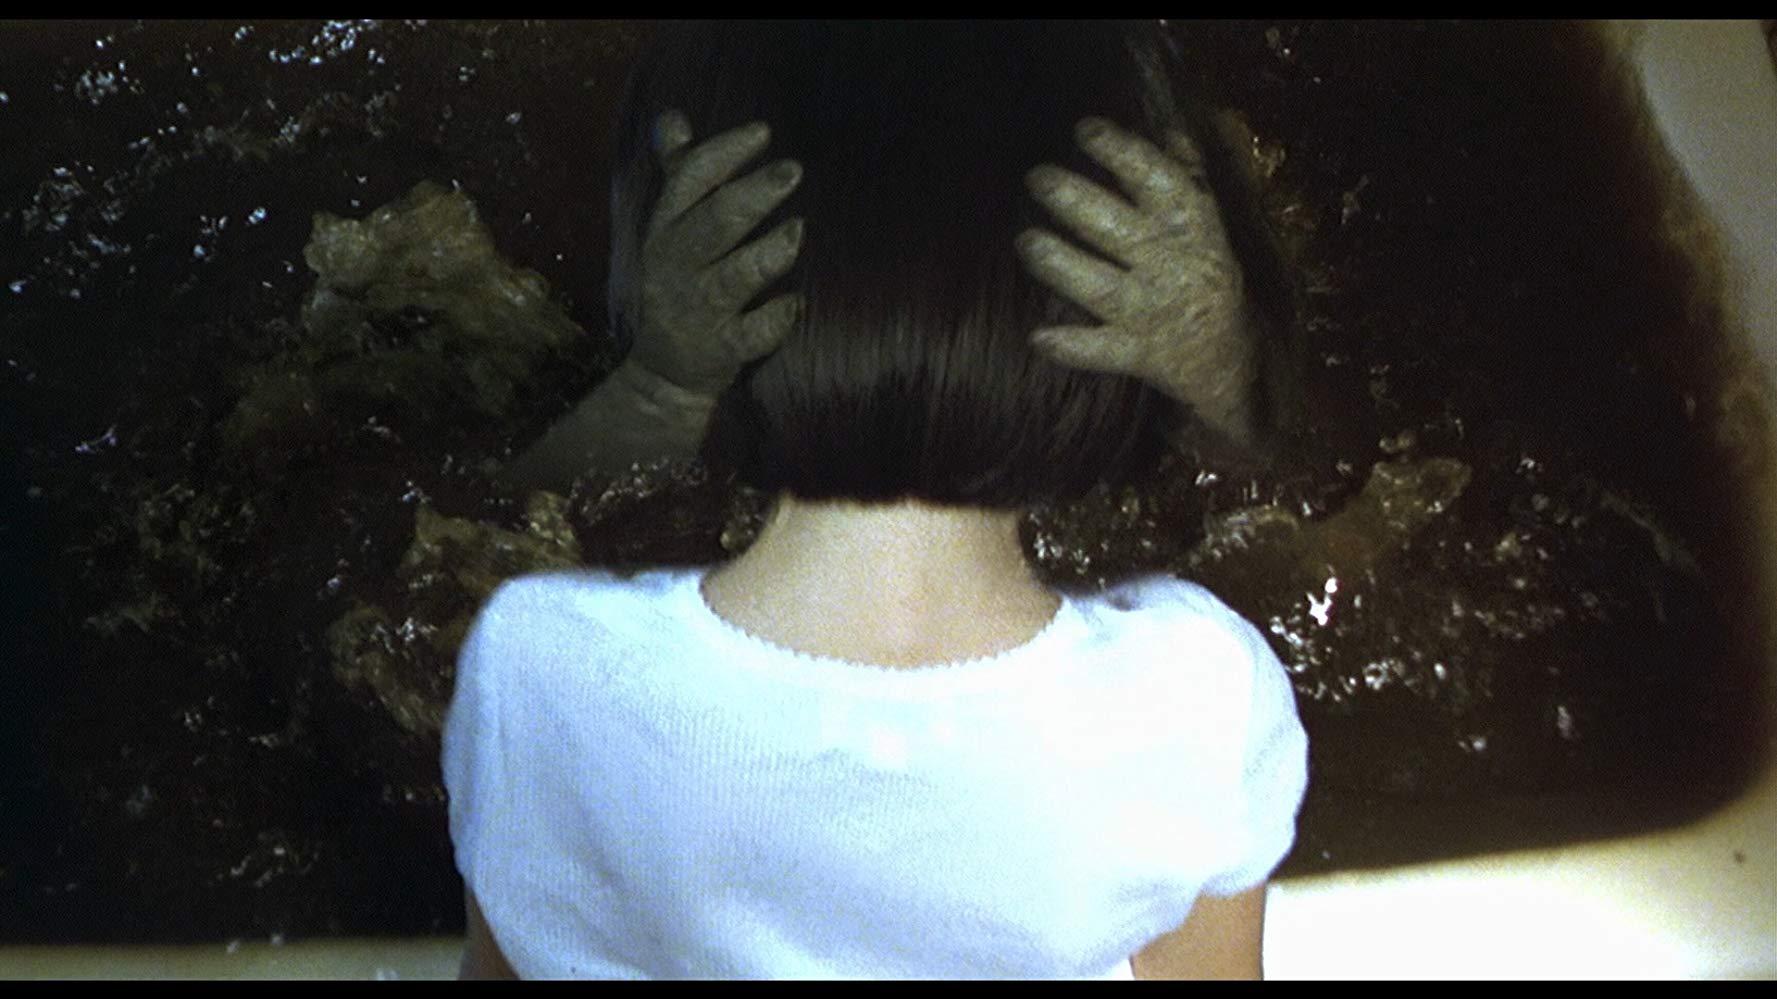 DARK WATER hhh - 10 فیلم ترسناک ژاپنی که نباید به تنهایی نگاه کنید!